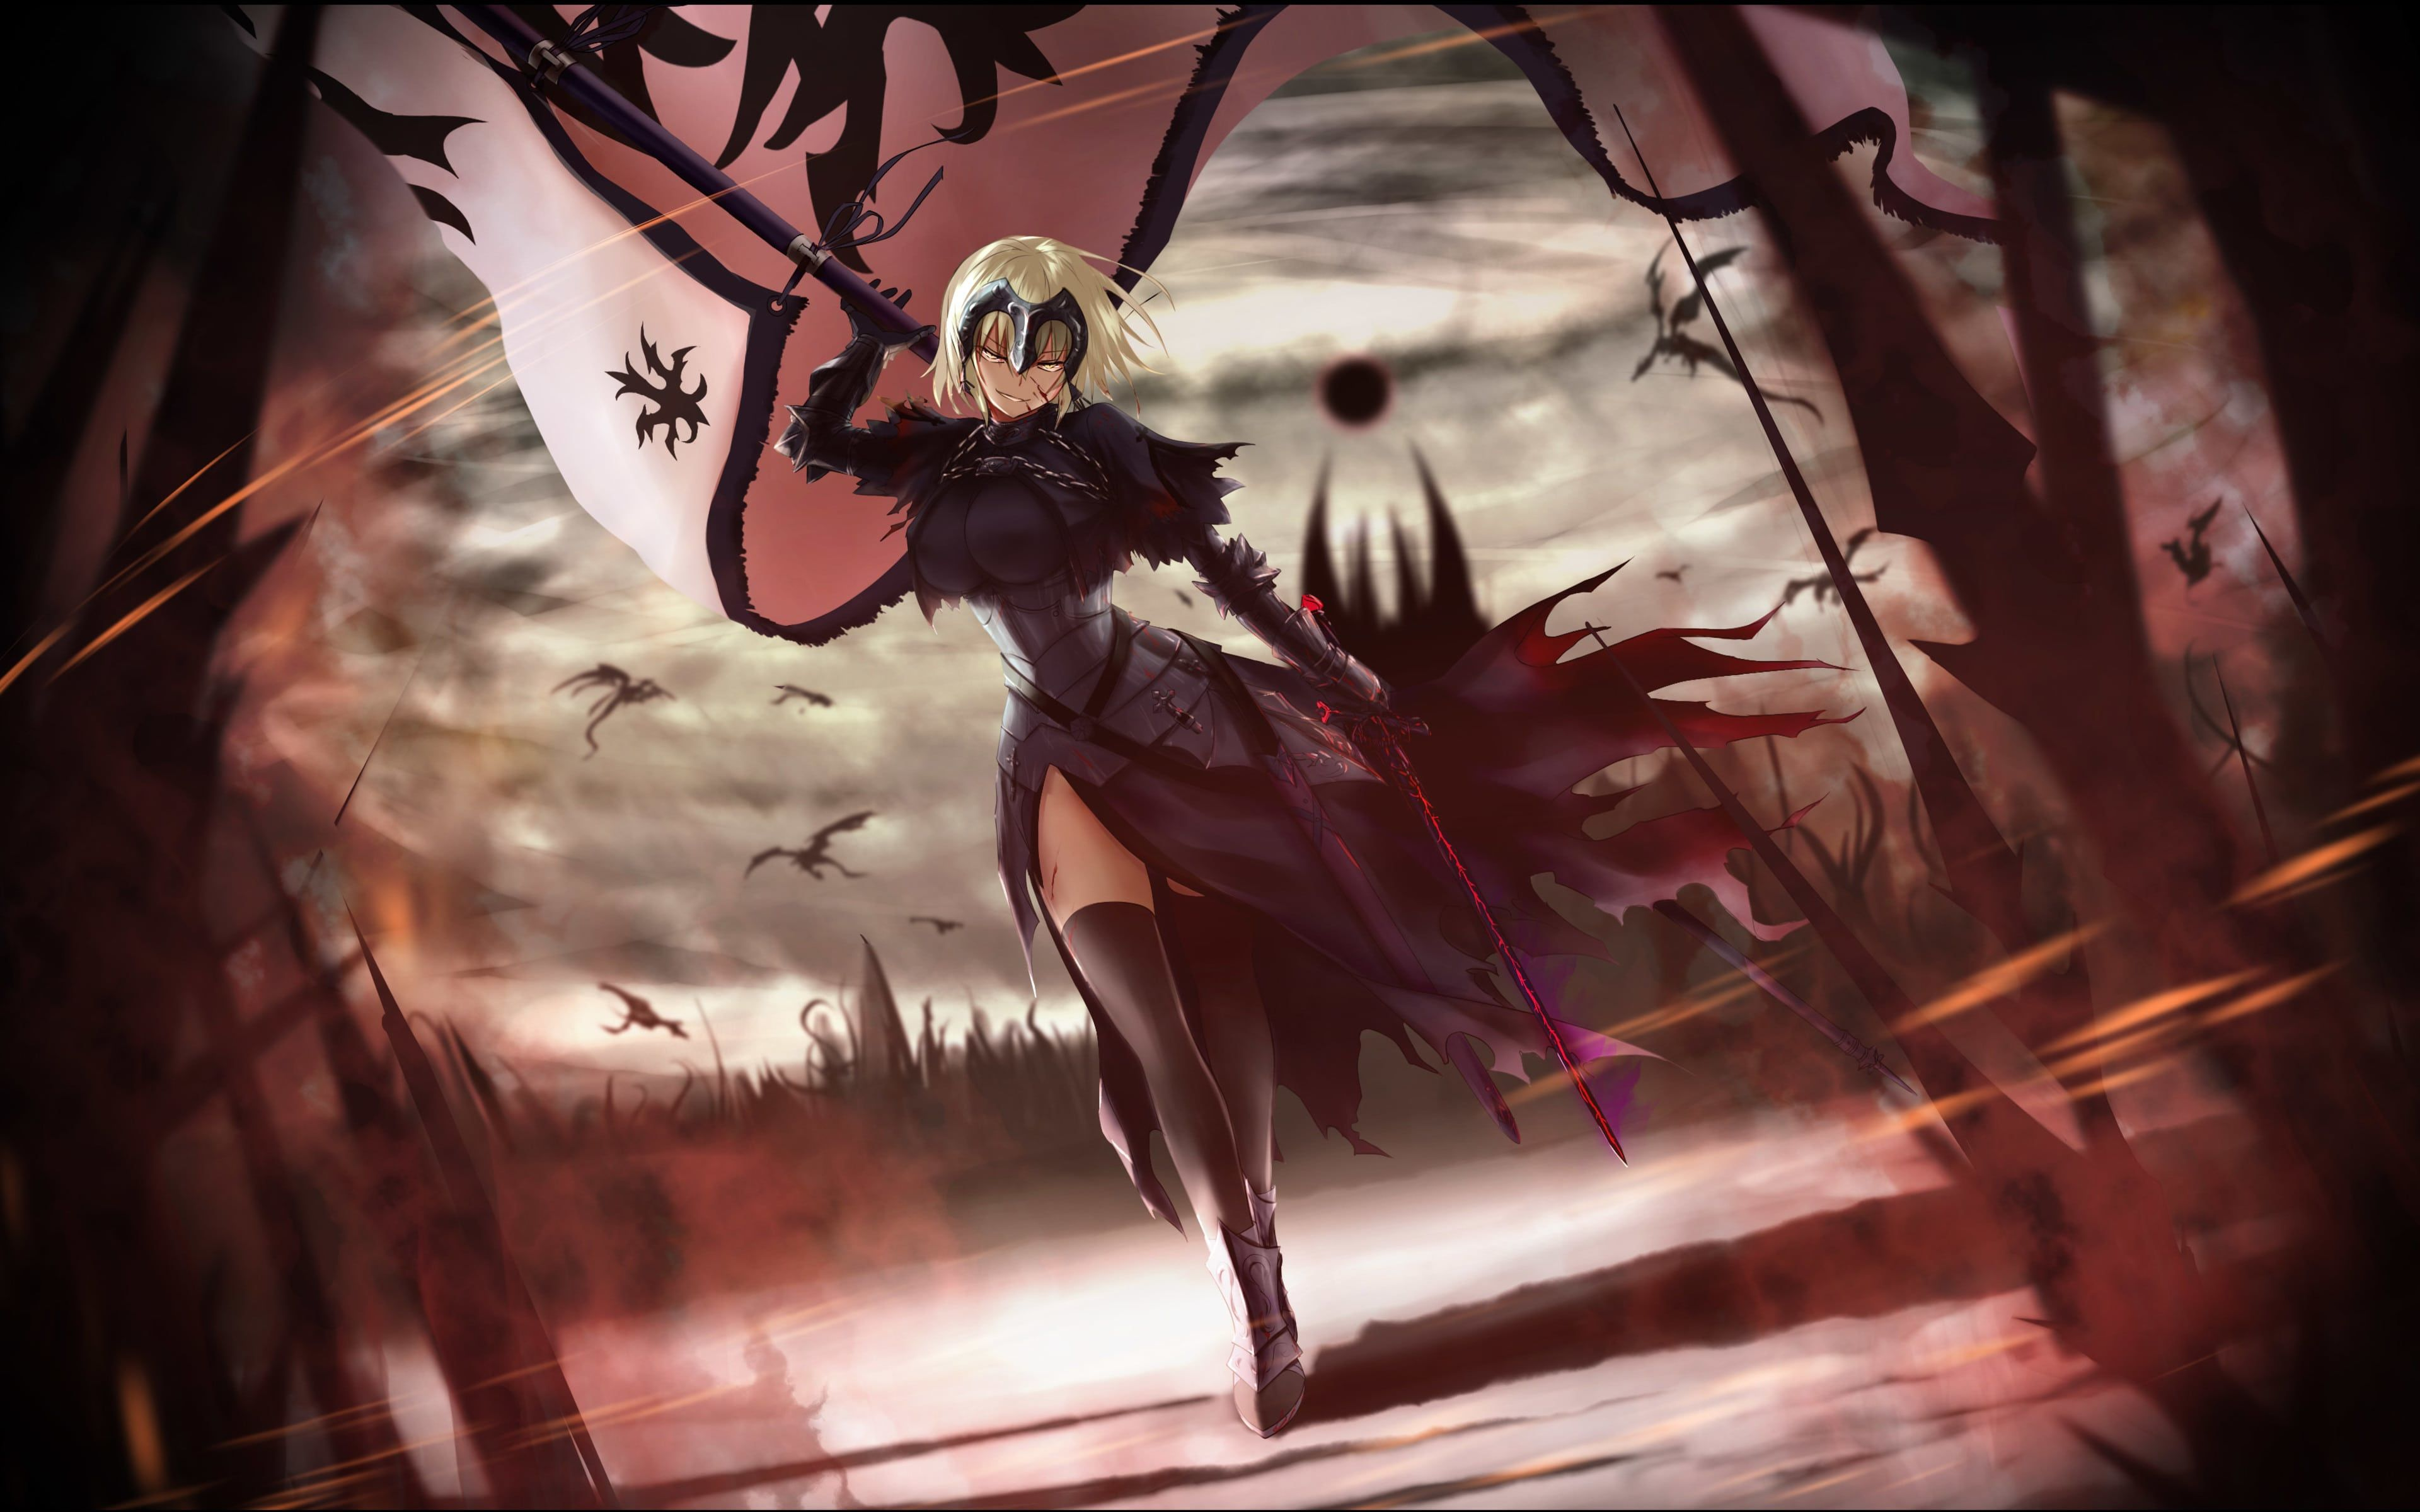 Anime fate grand order ศลปะอะนเมะ สาวอนเมะ และ สอนวาดรป